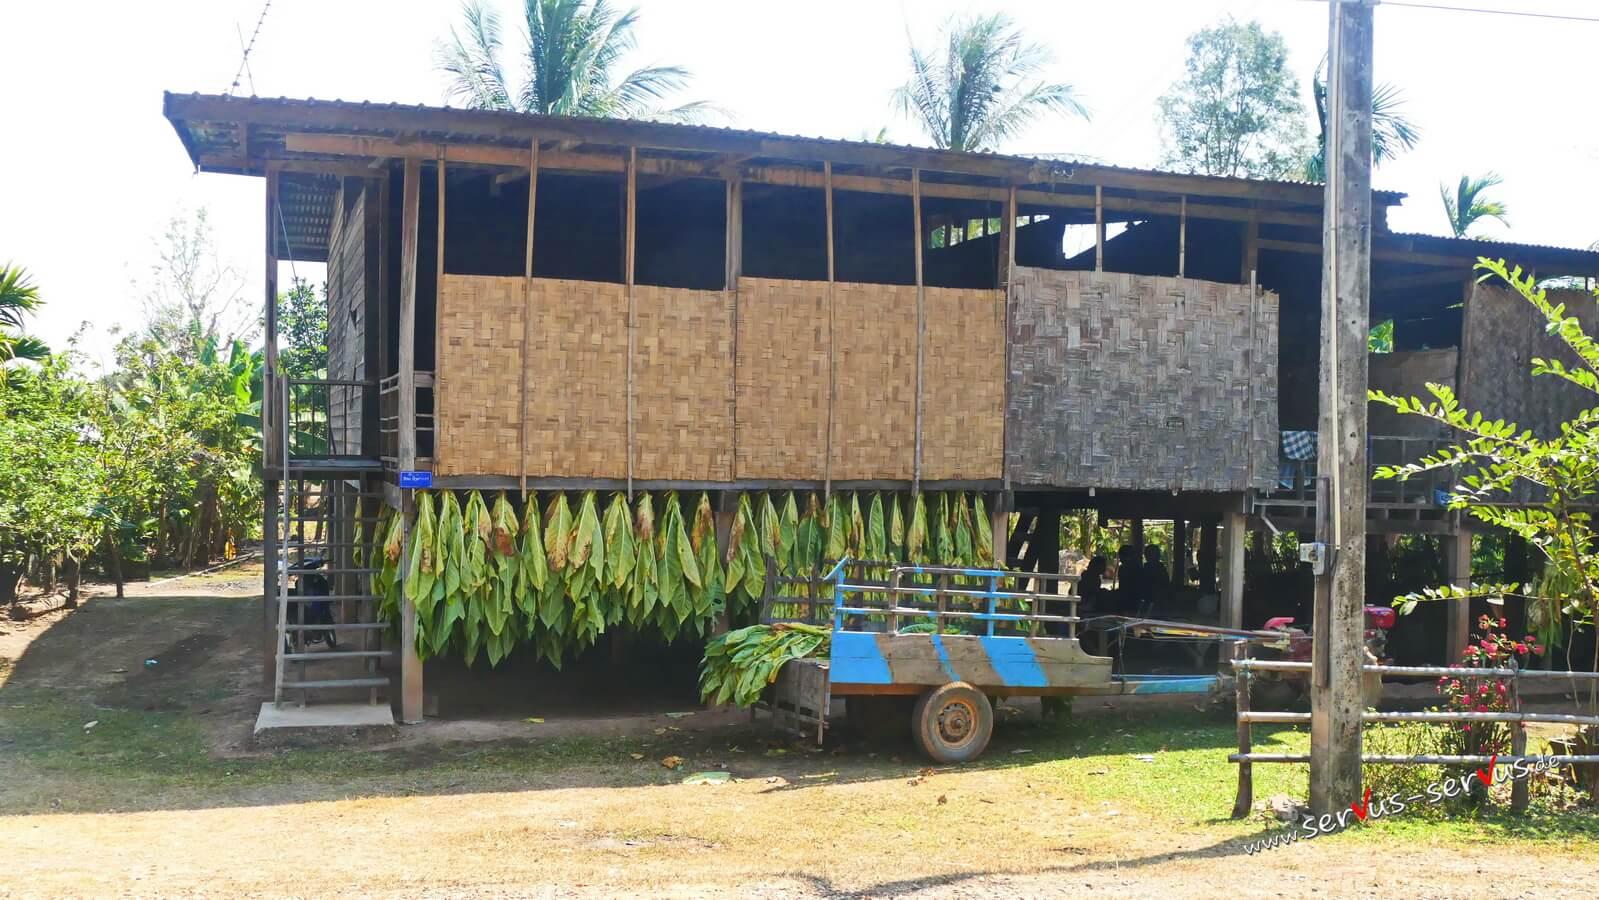 getrockneter Tabak am Straßenrand in Laos